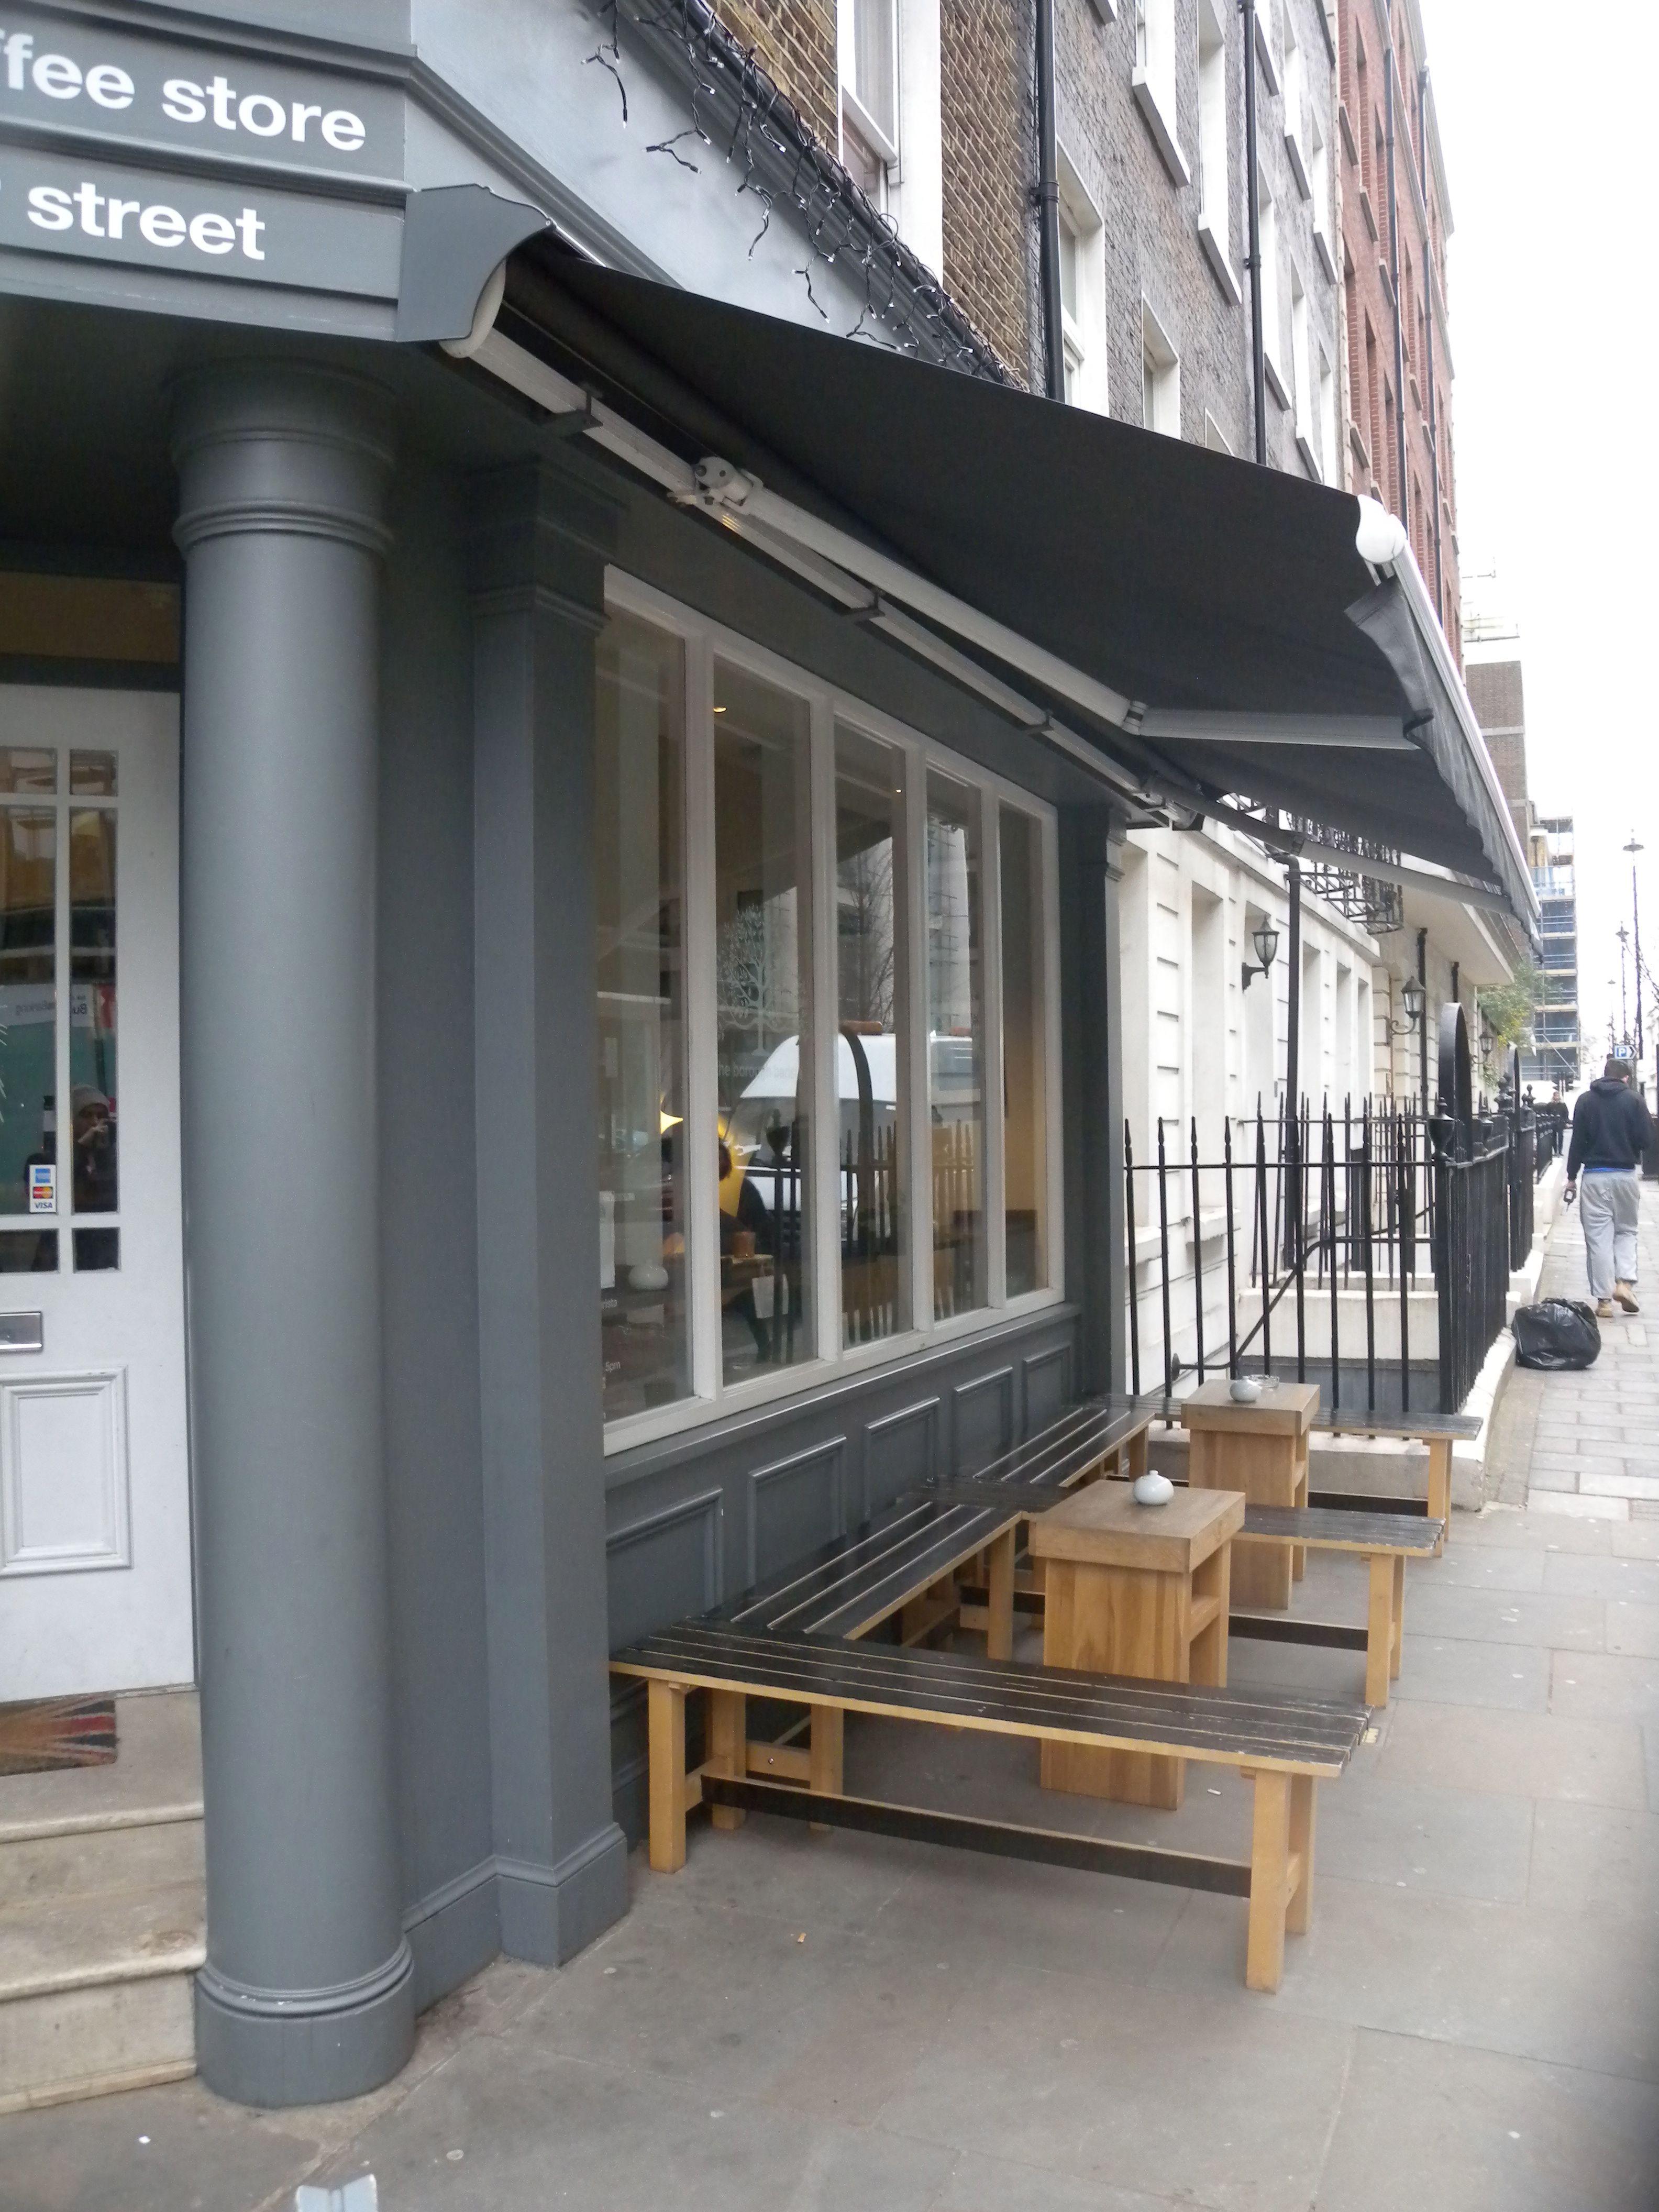 Borough barista marlebone london cafe seating